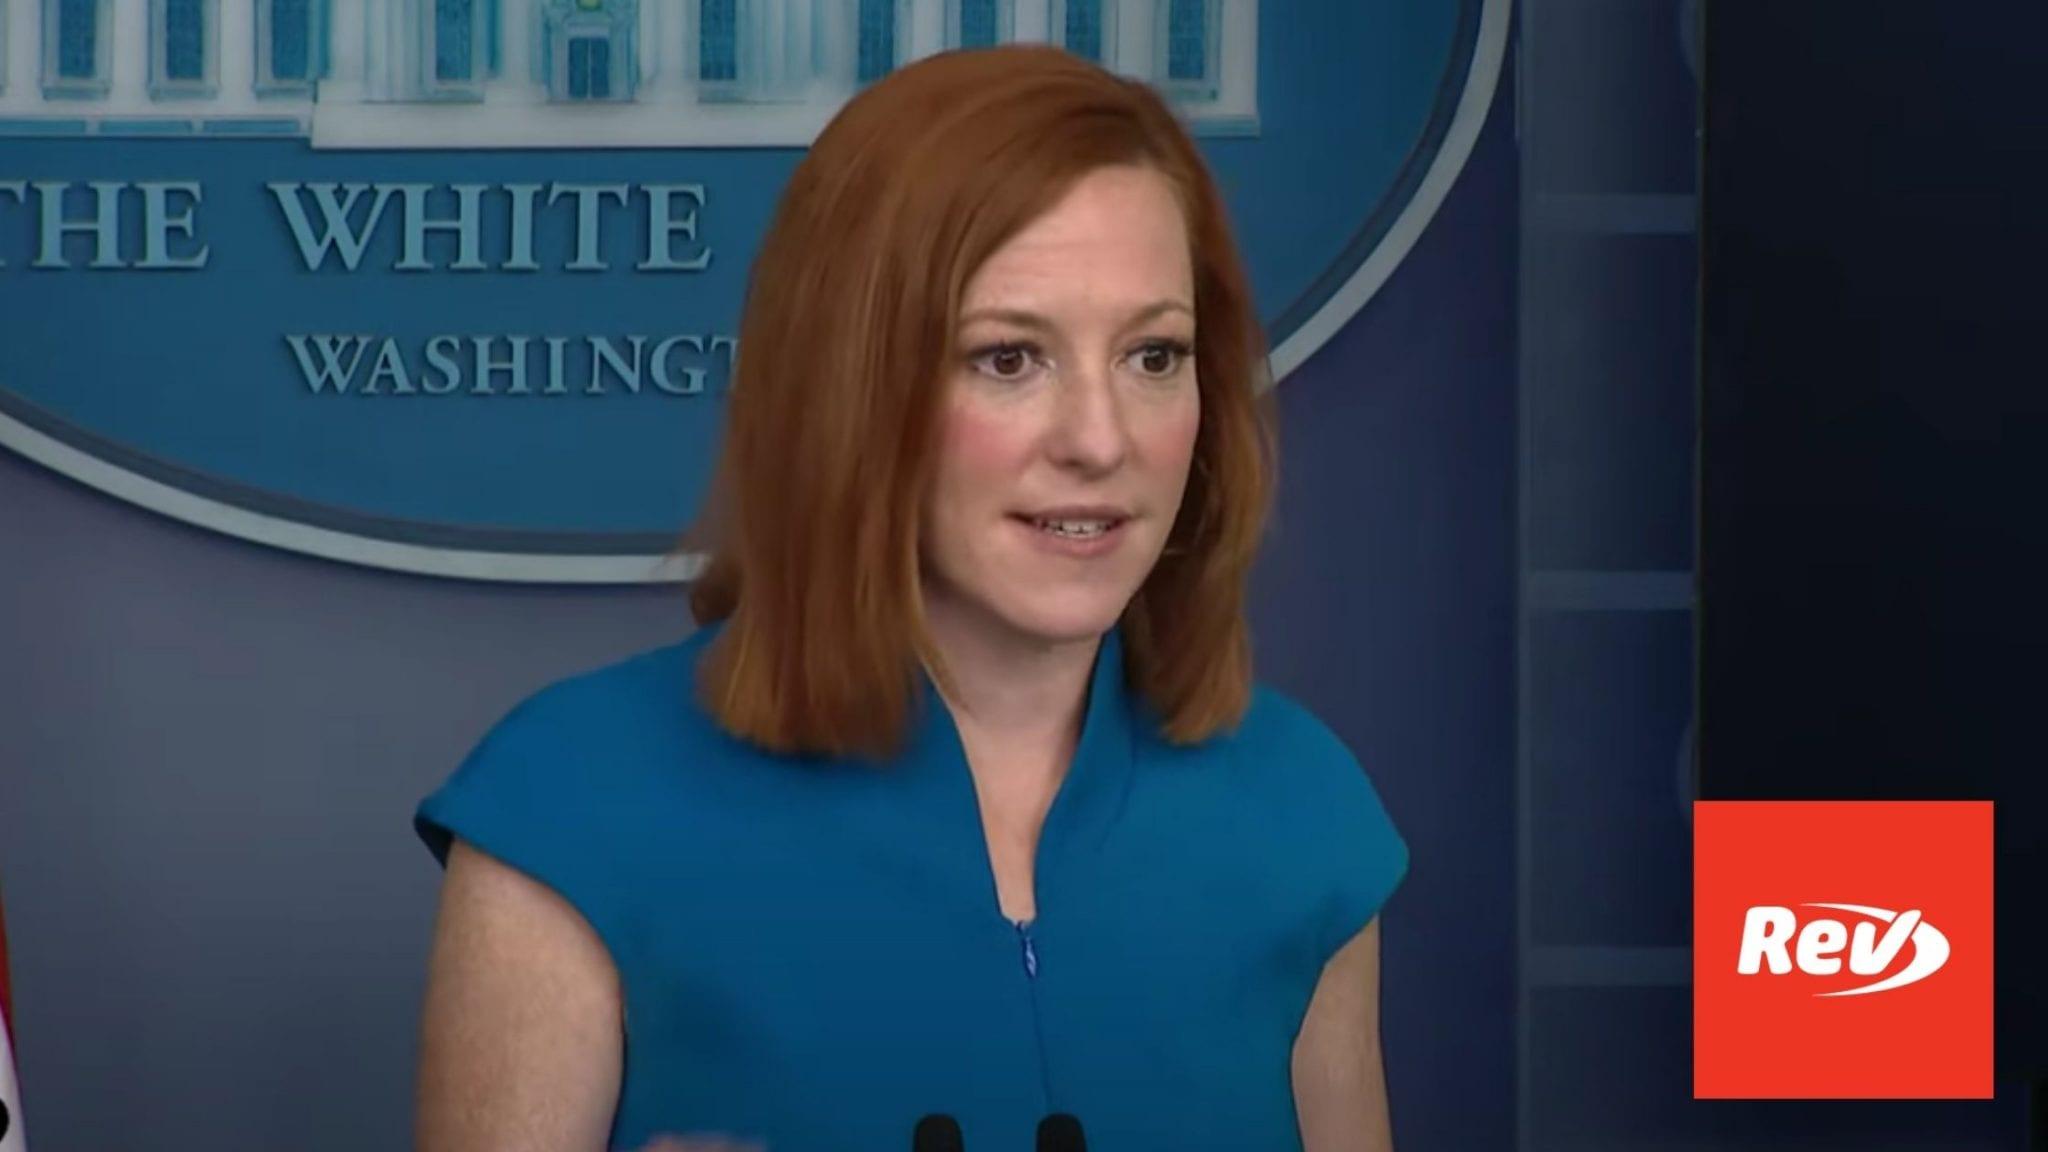 Press Secretary Jen Psaki White House Press Conference Transcript June 4